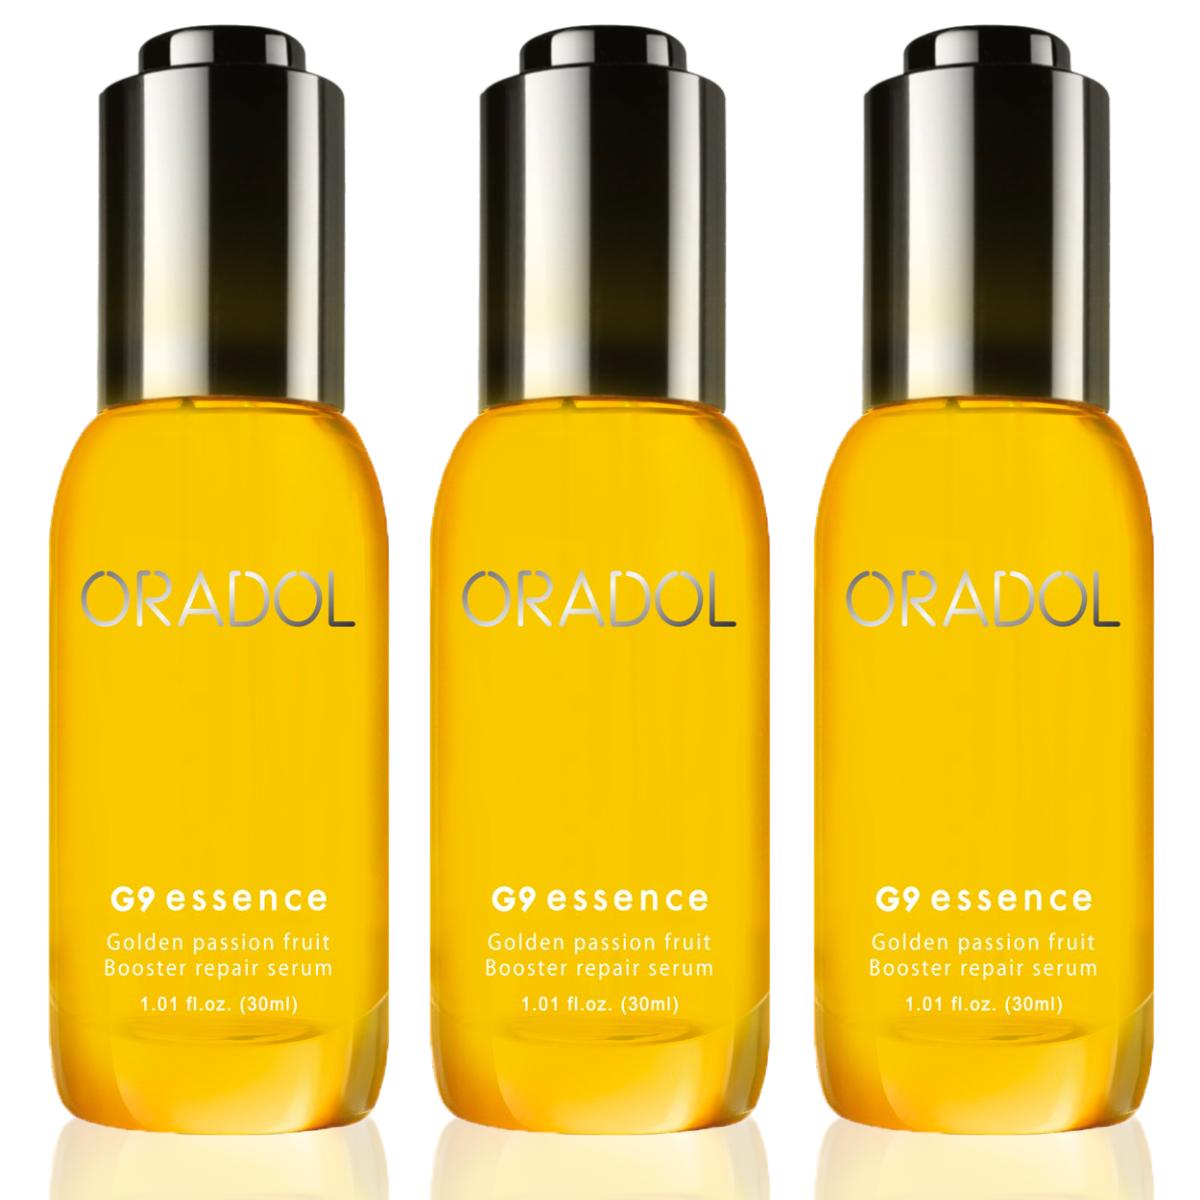 Oradol serum 30 ml ออราดอลซีรั่ม Booster repair serum 3 ขวด